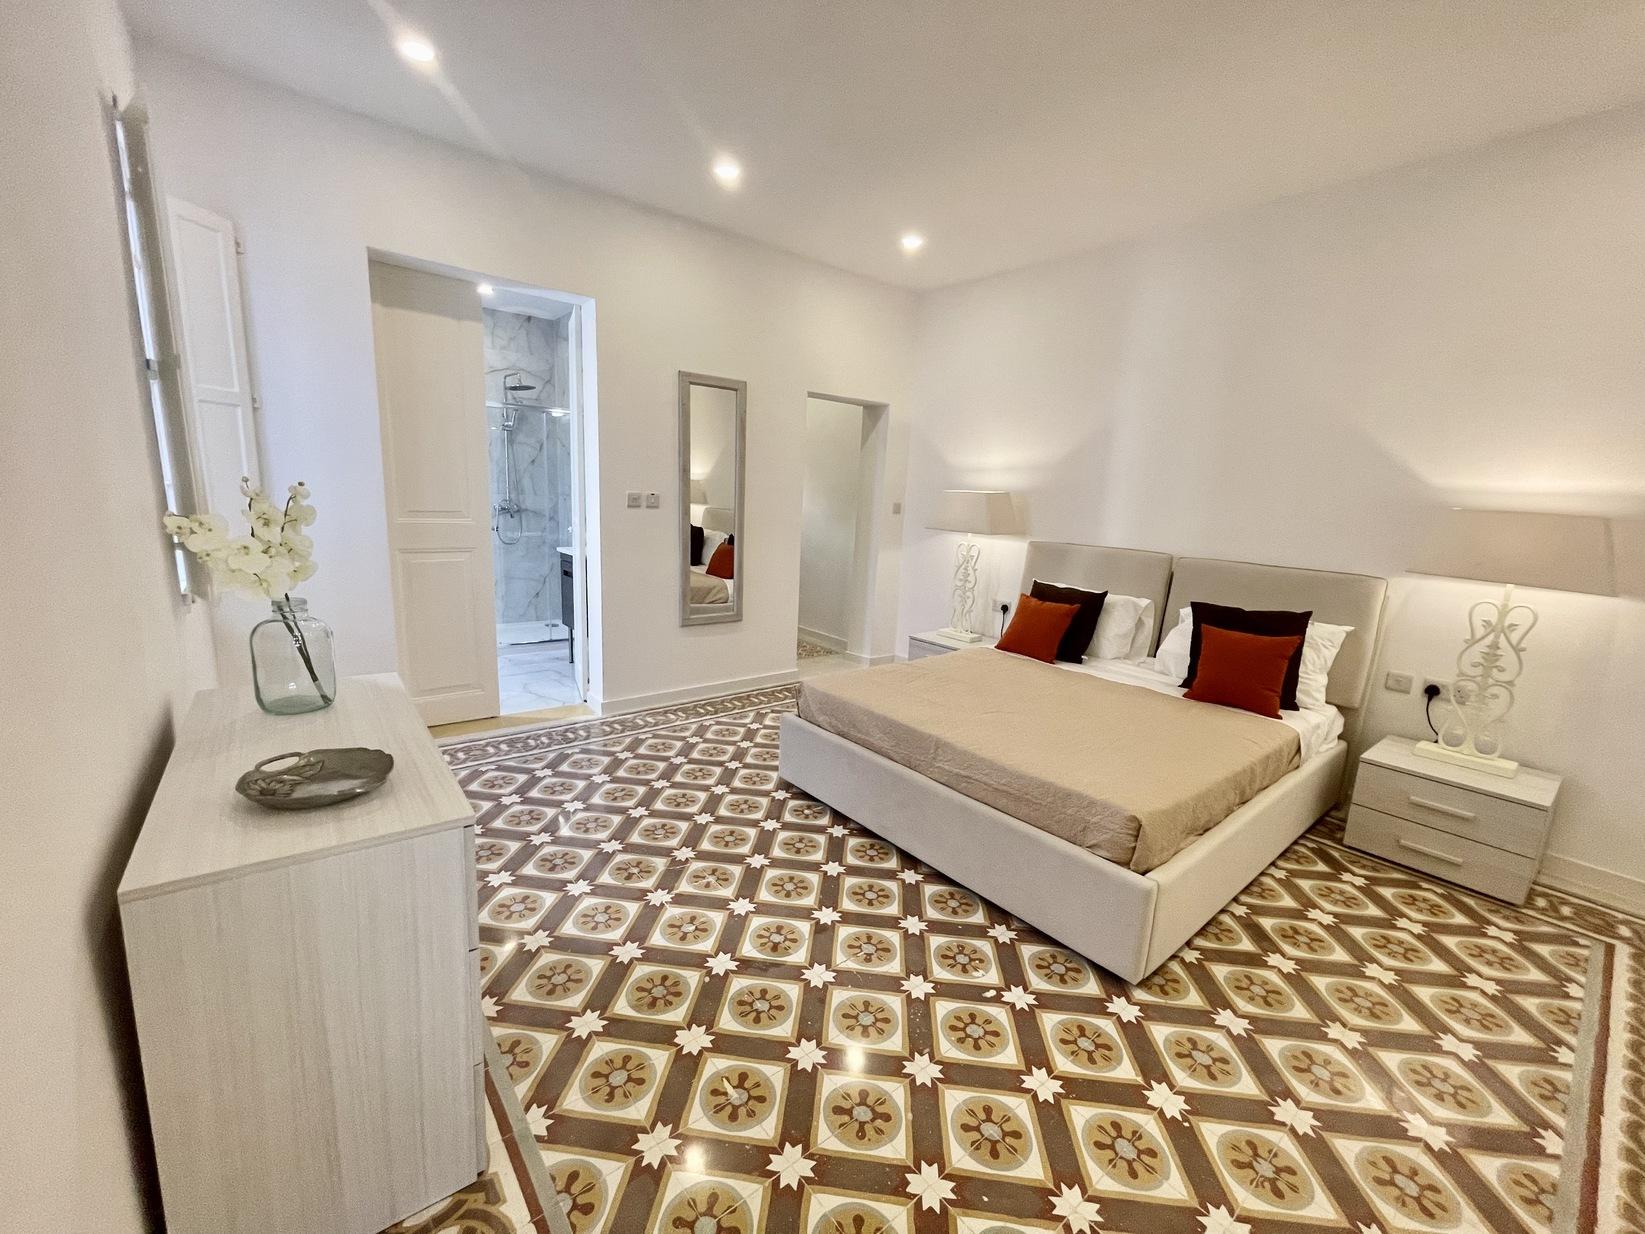 3 bed Town House For Rent in Kalkara, Kalkara - thumb 11